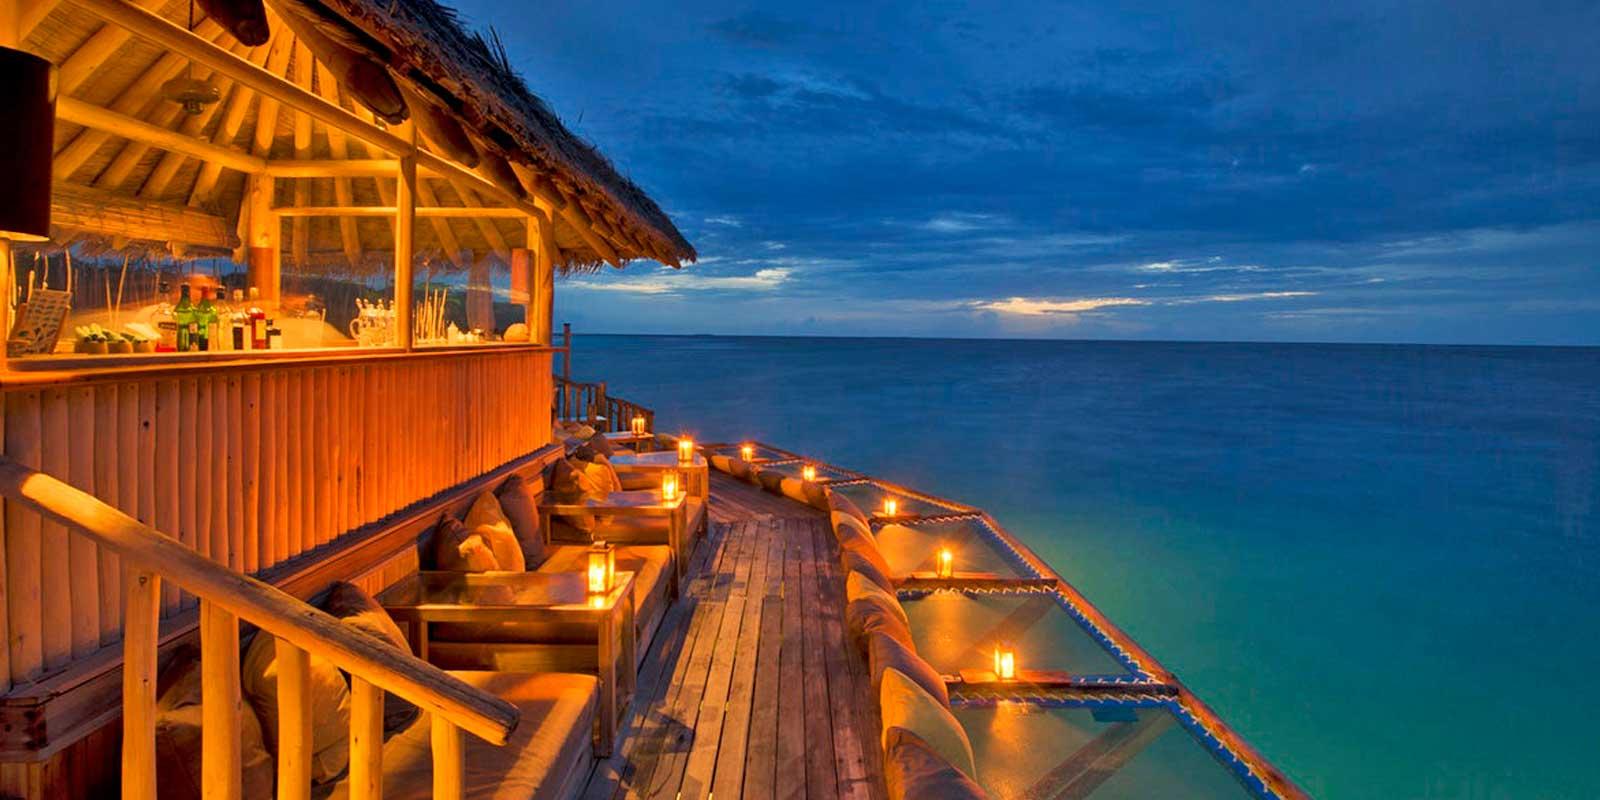 OCOA_SONEVA_FUSHI_RESORT_MALDIVES_8